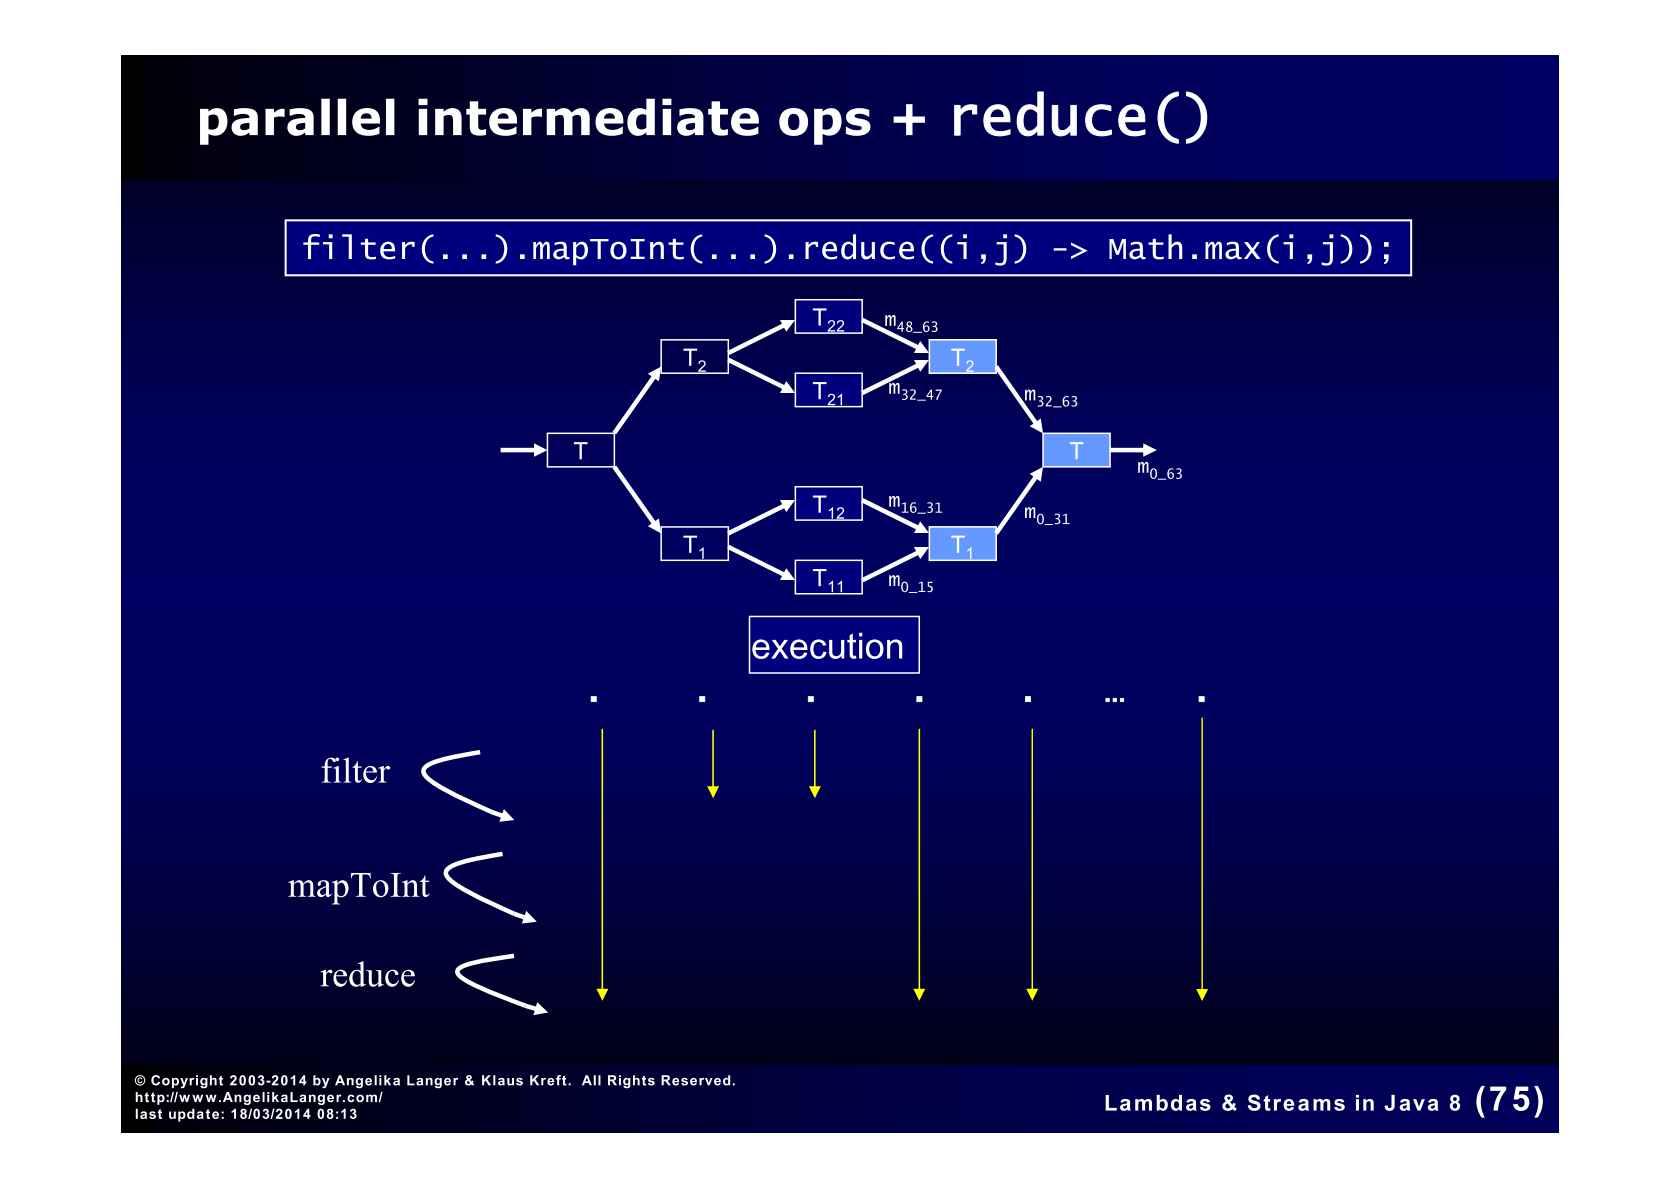 Lambdas And Streams In Java 8 Logic Diagram 3